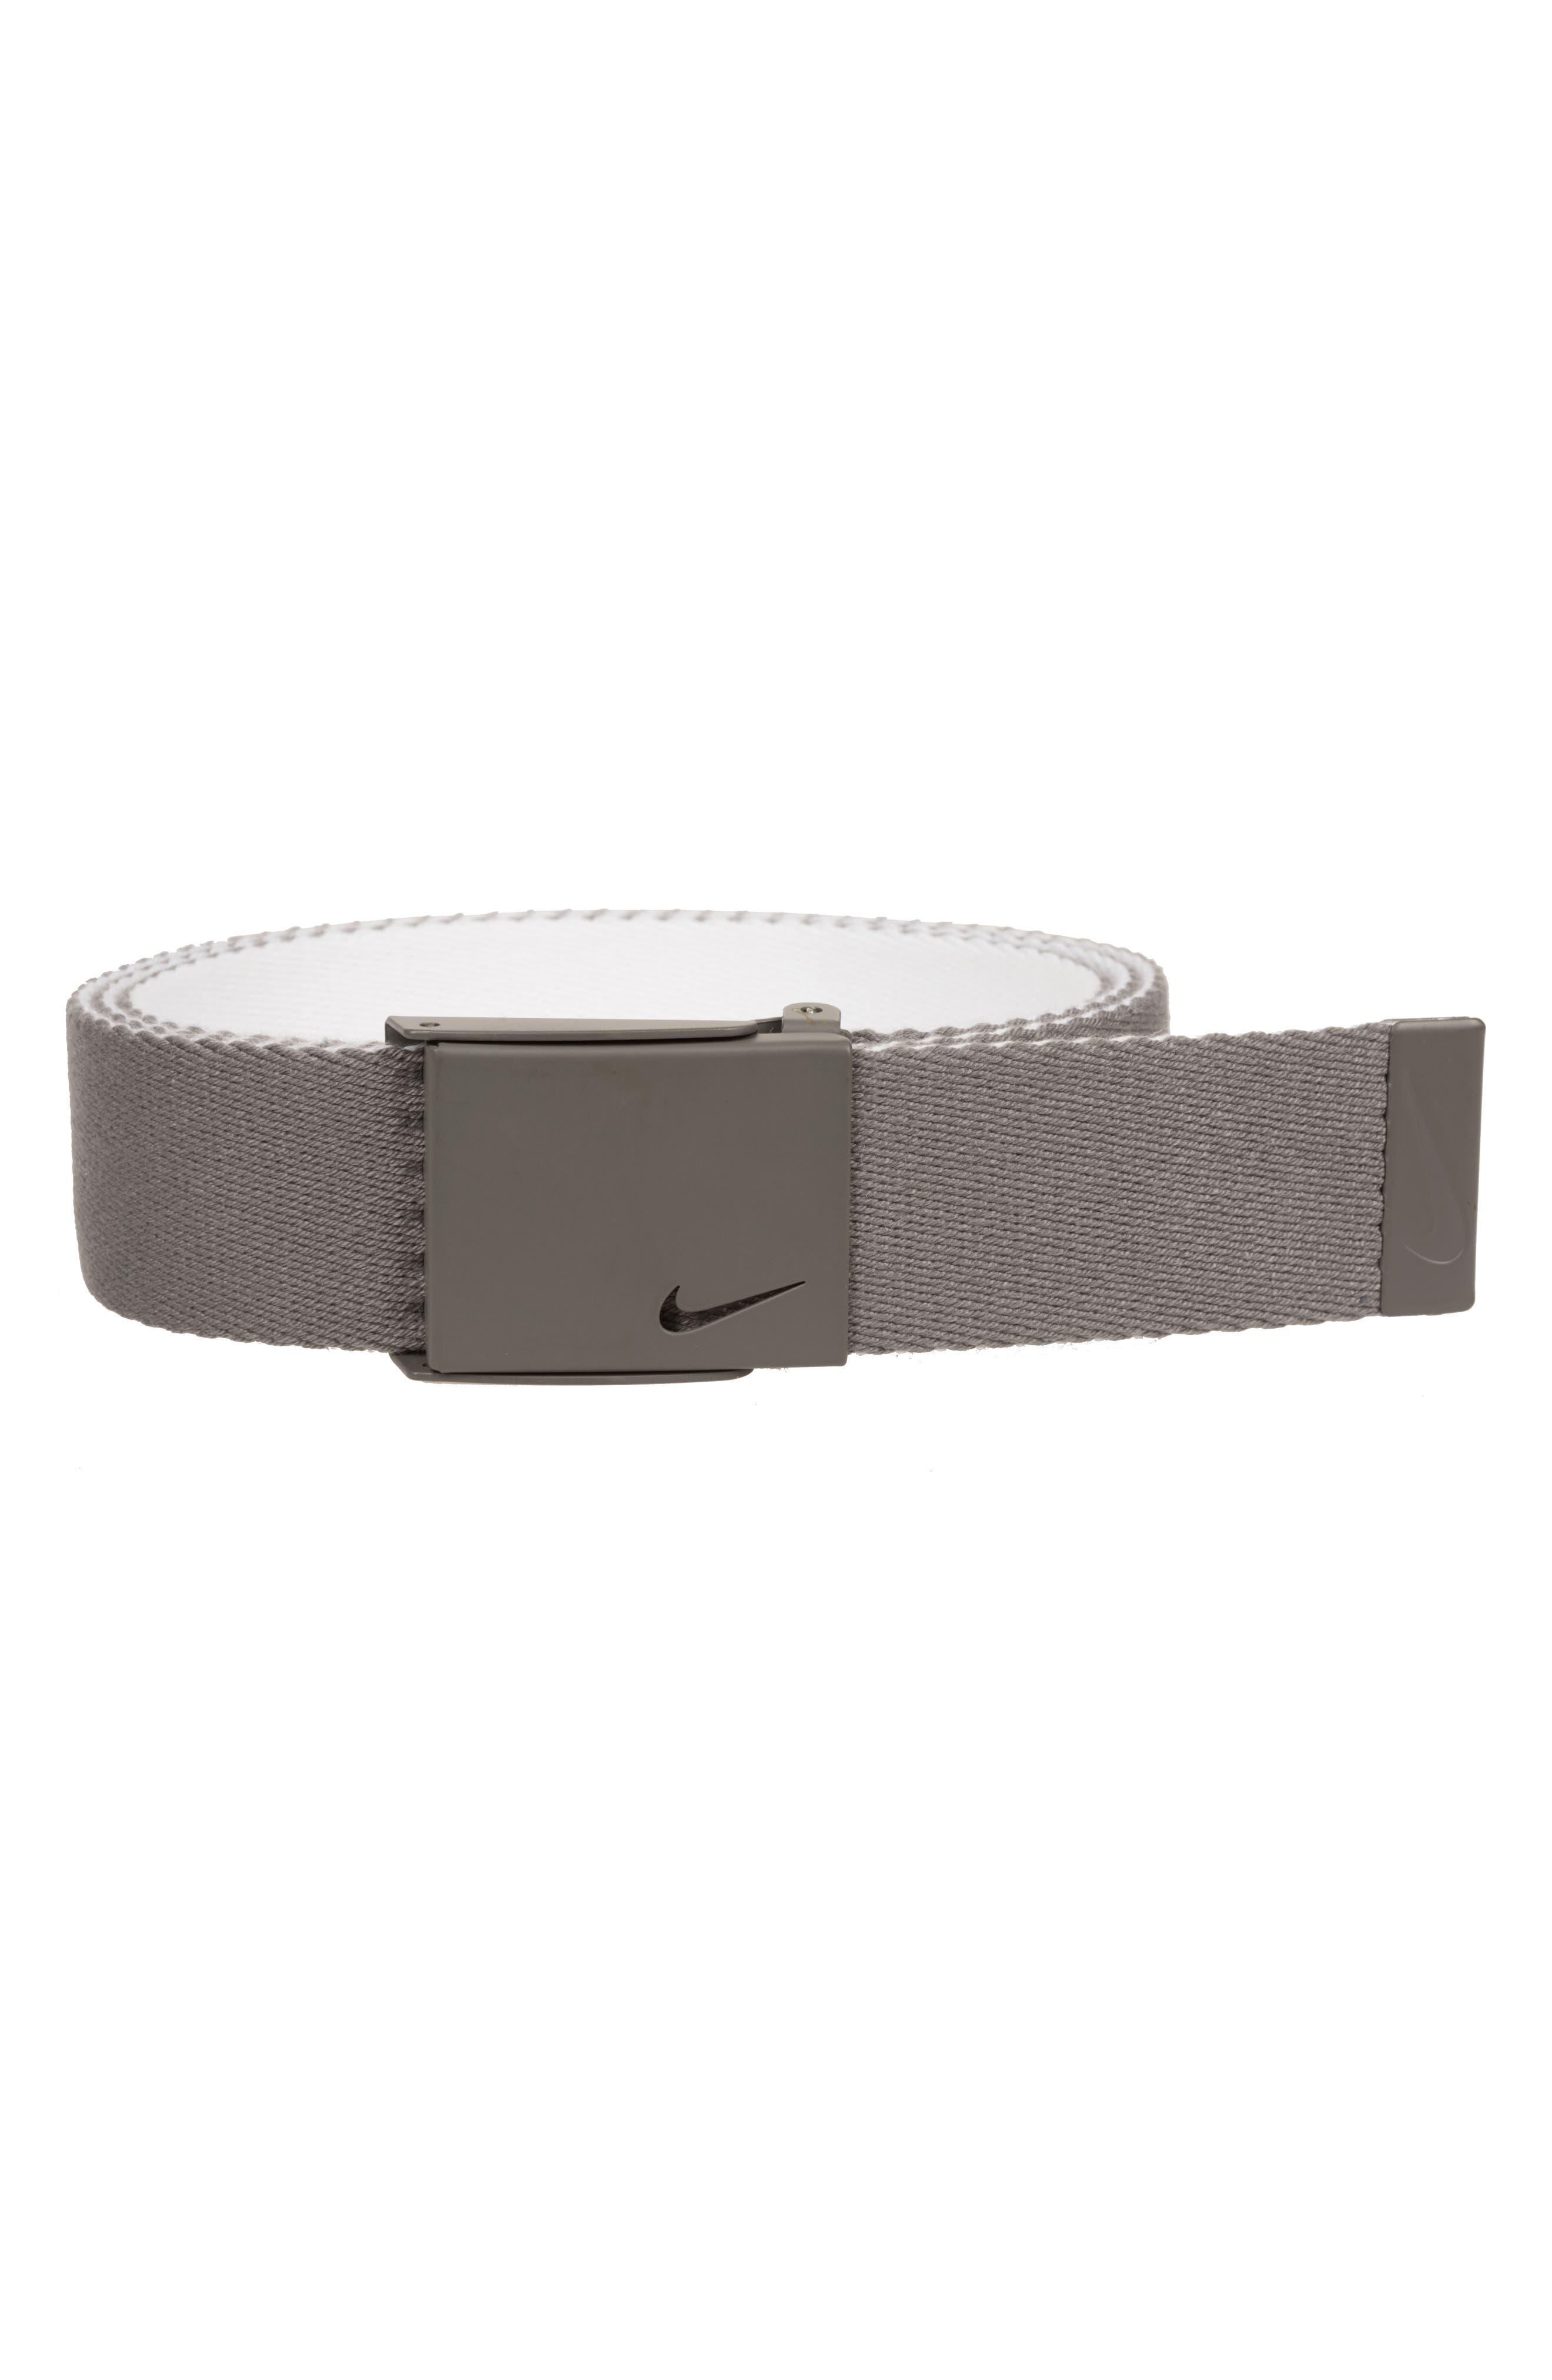 Essentials Reversible Webbed Belt, Main, color, LIGHT CHARCOAL/ WHITE